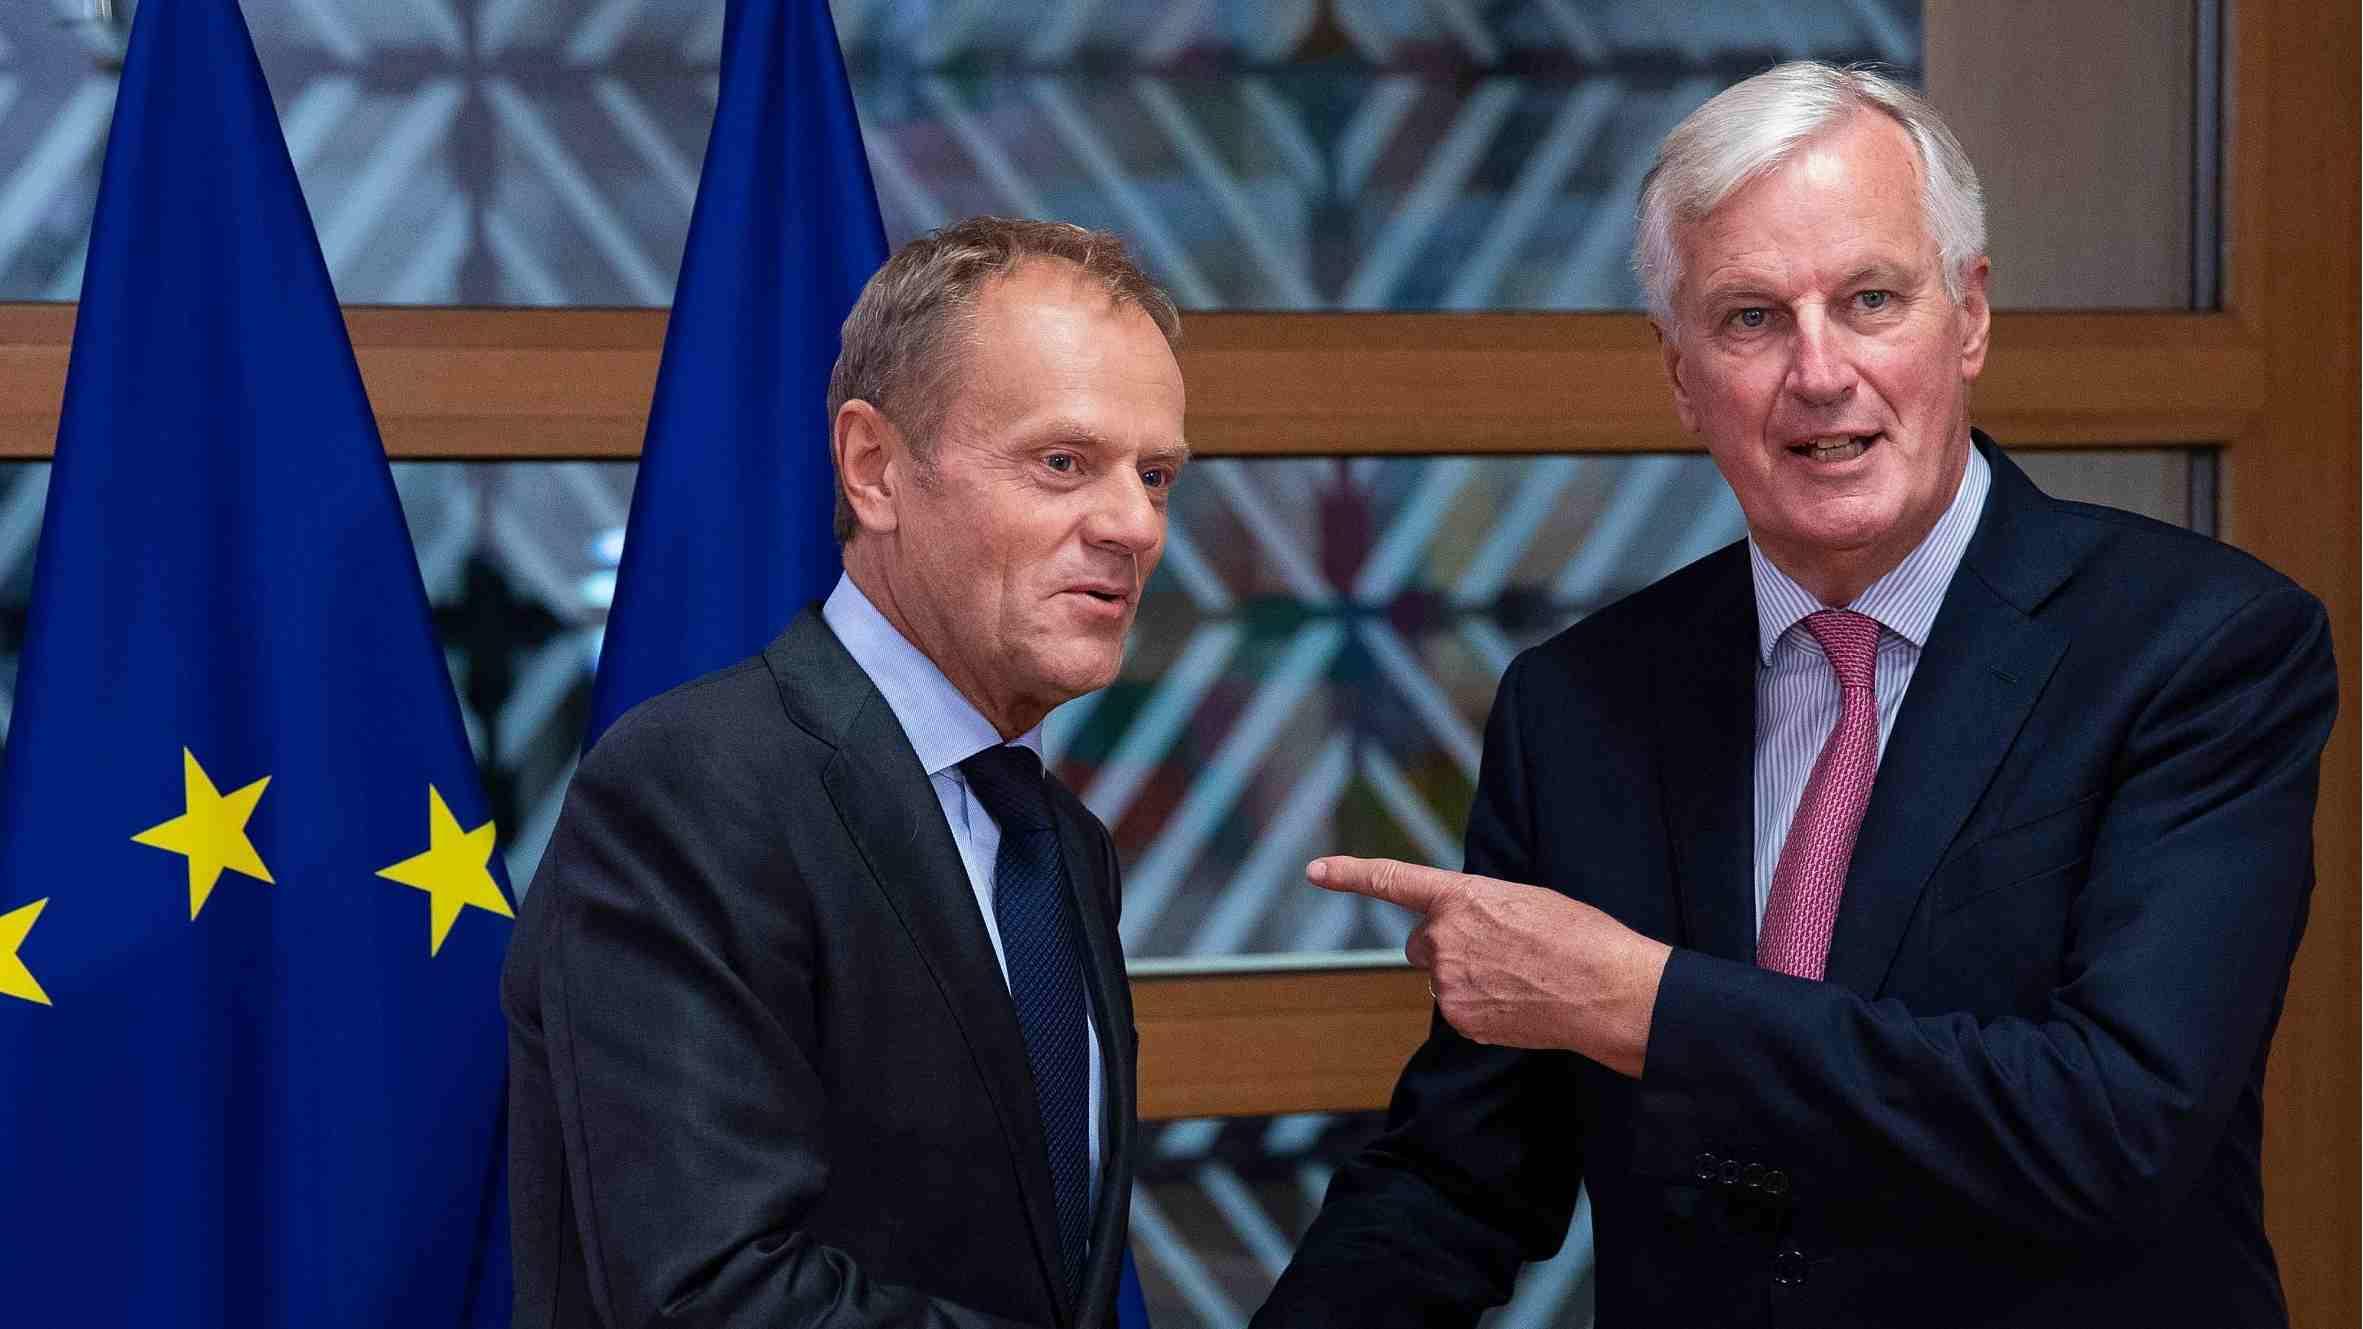 EU leaders target Brexit breakthrough at Austria summit